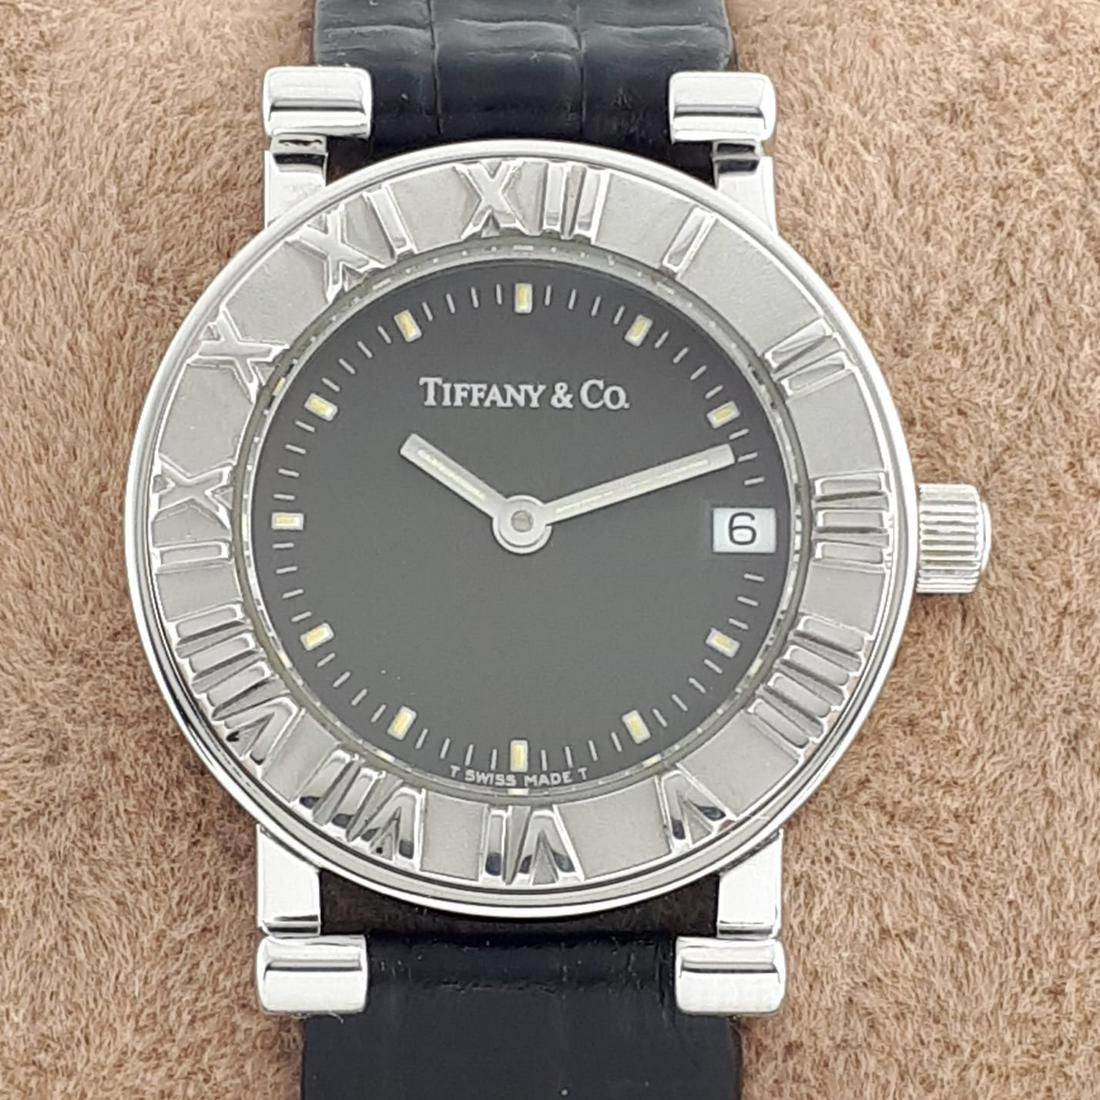 Tiffany & Co. - Atlas - Women - 2011-present